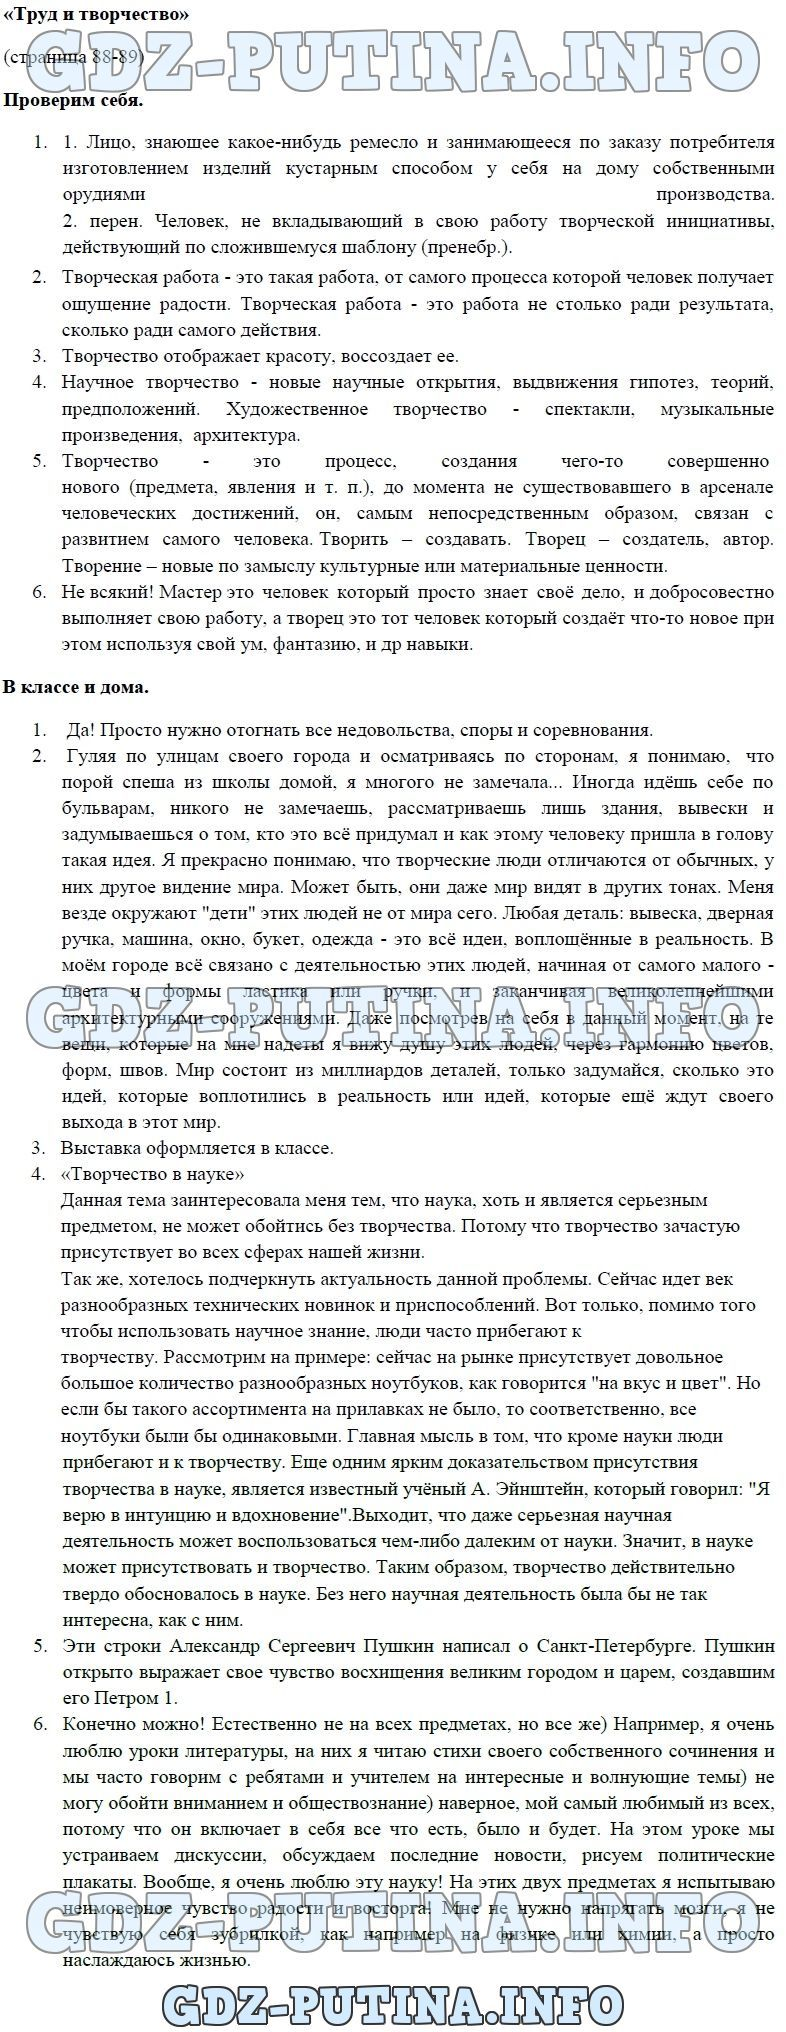 Химия класс гдз к учебнику минченкова